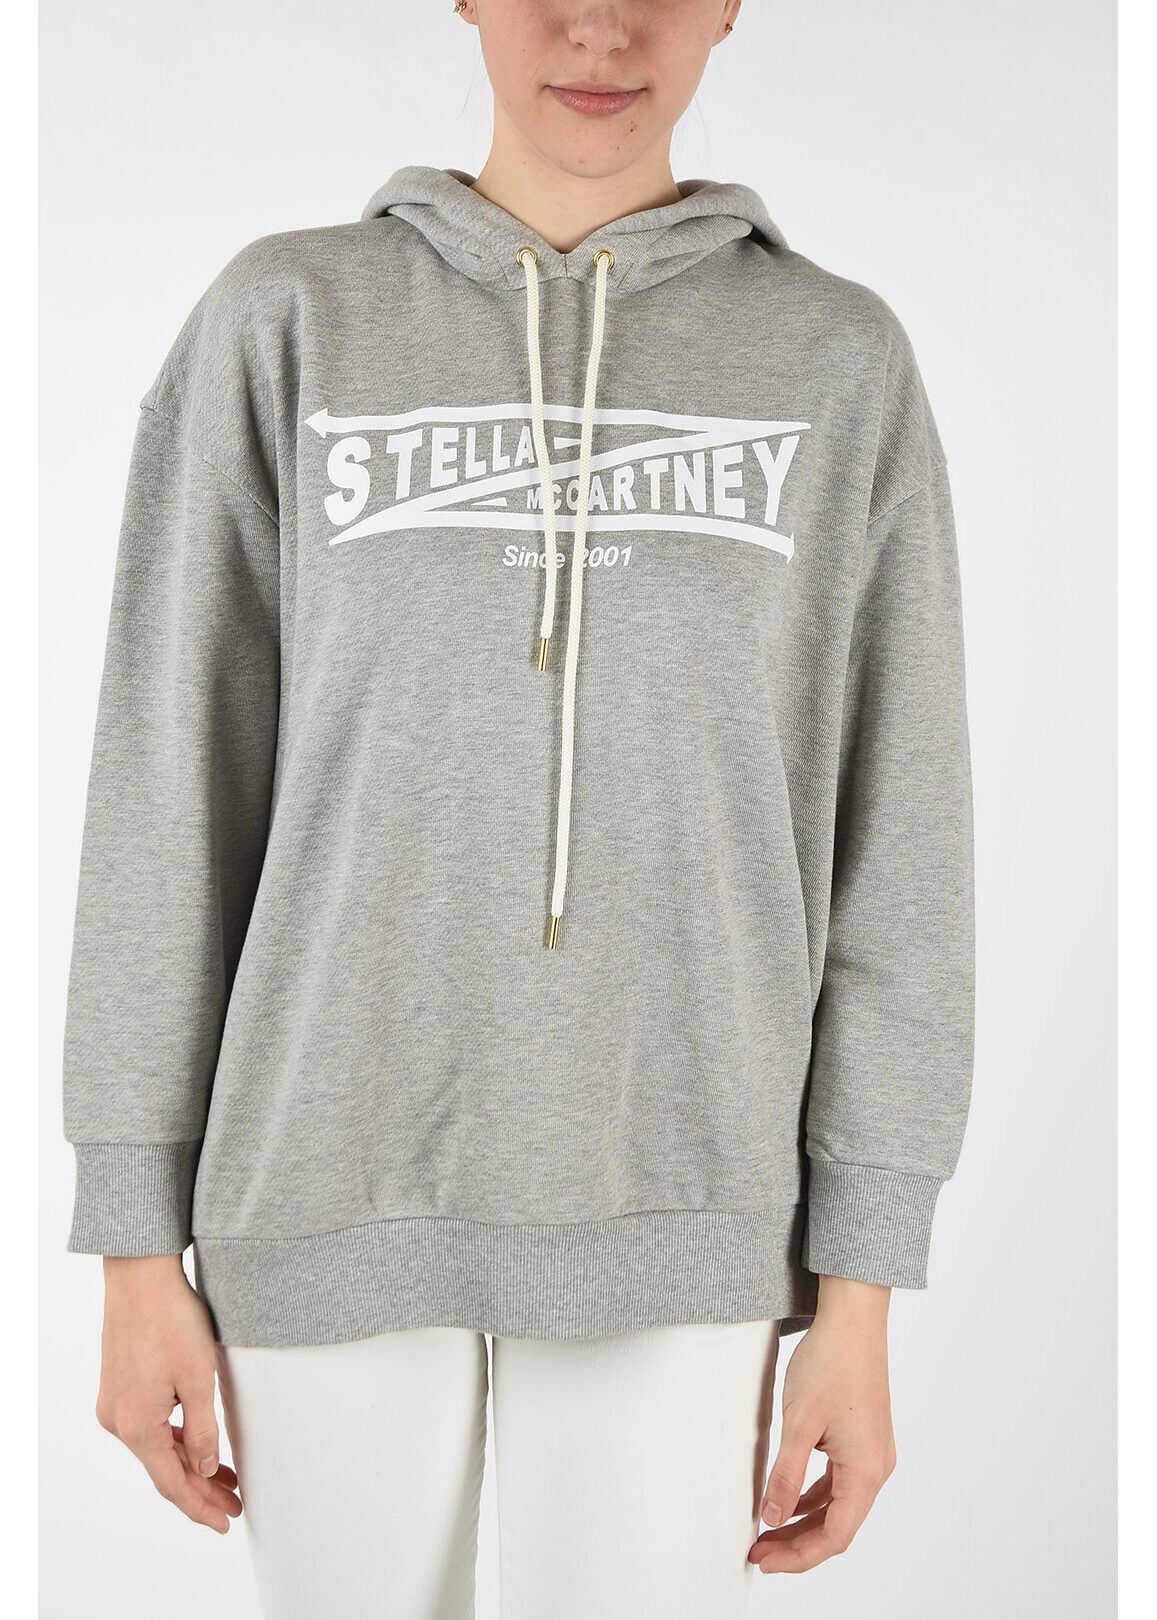 adidas by Stella McCartney hoodie sweatshirt GRAY